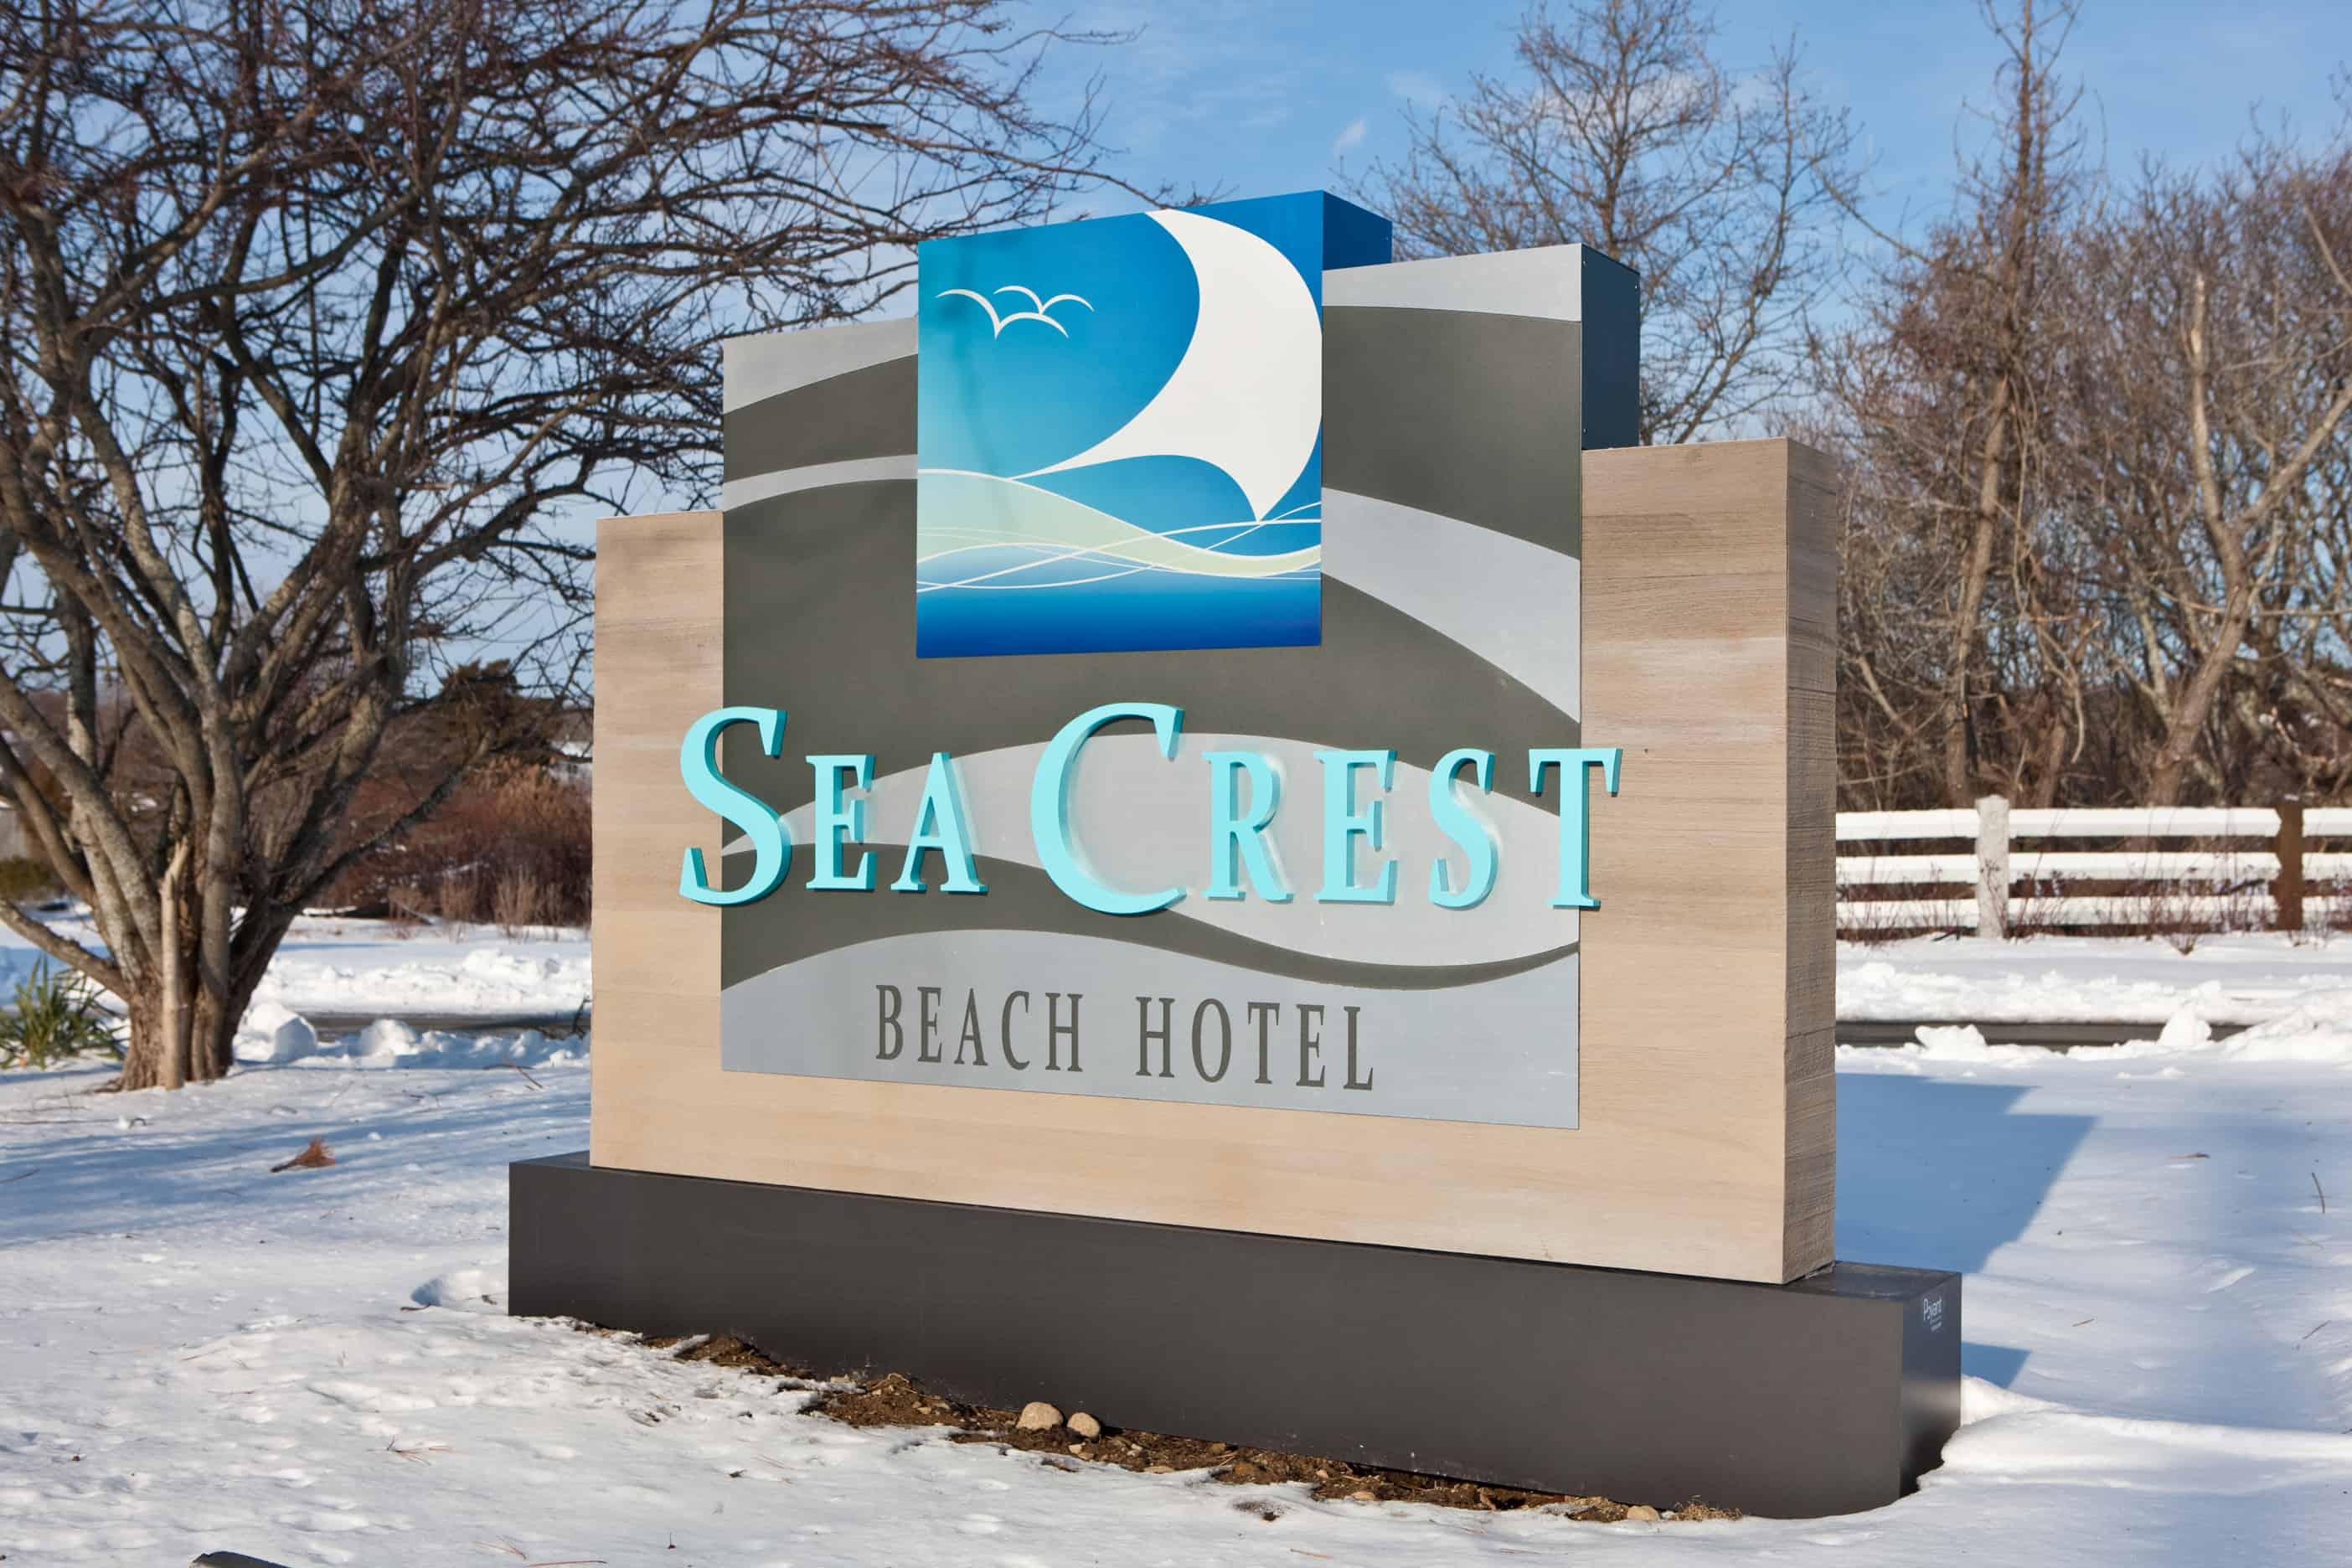 Sea Crest 2